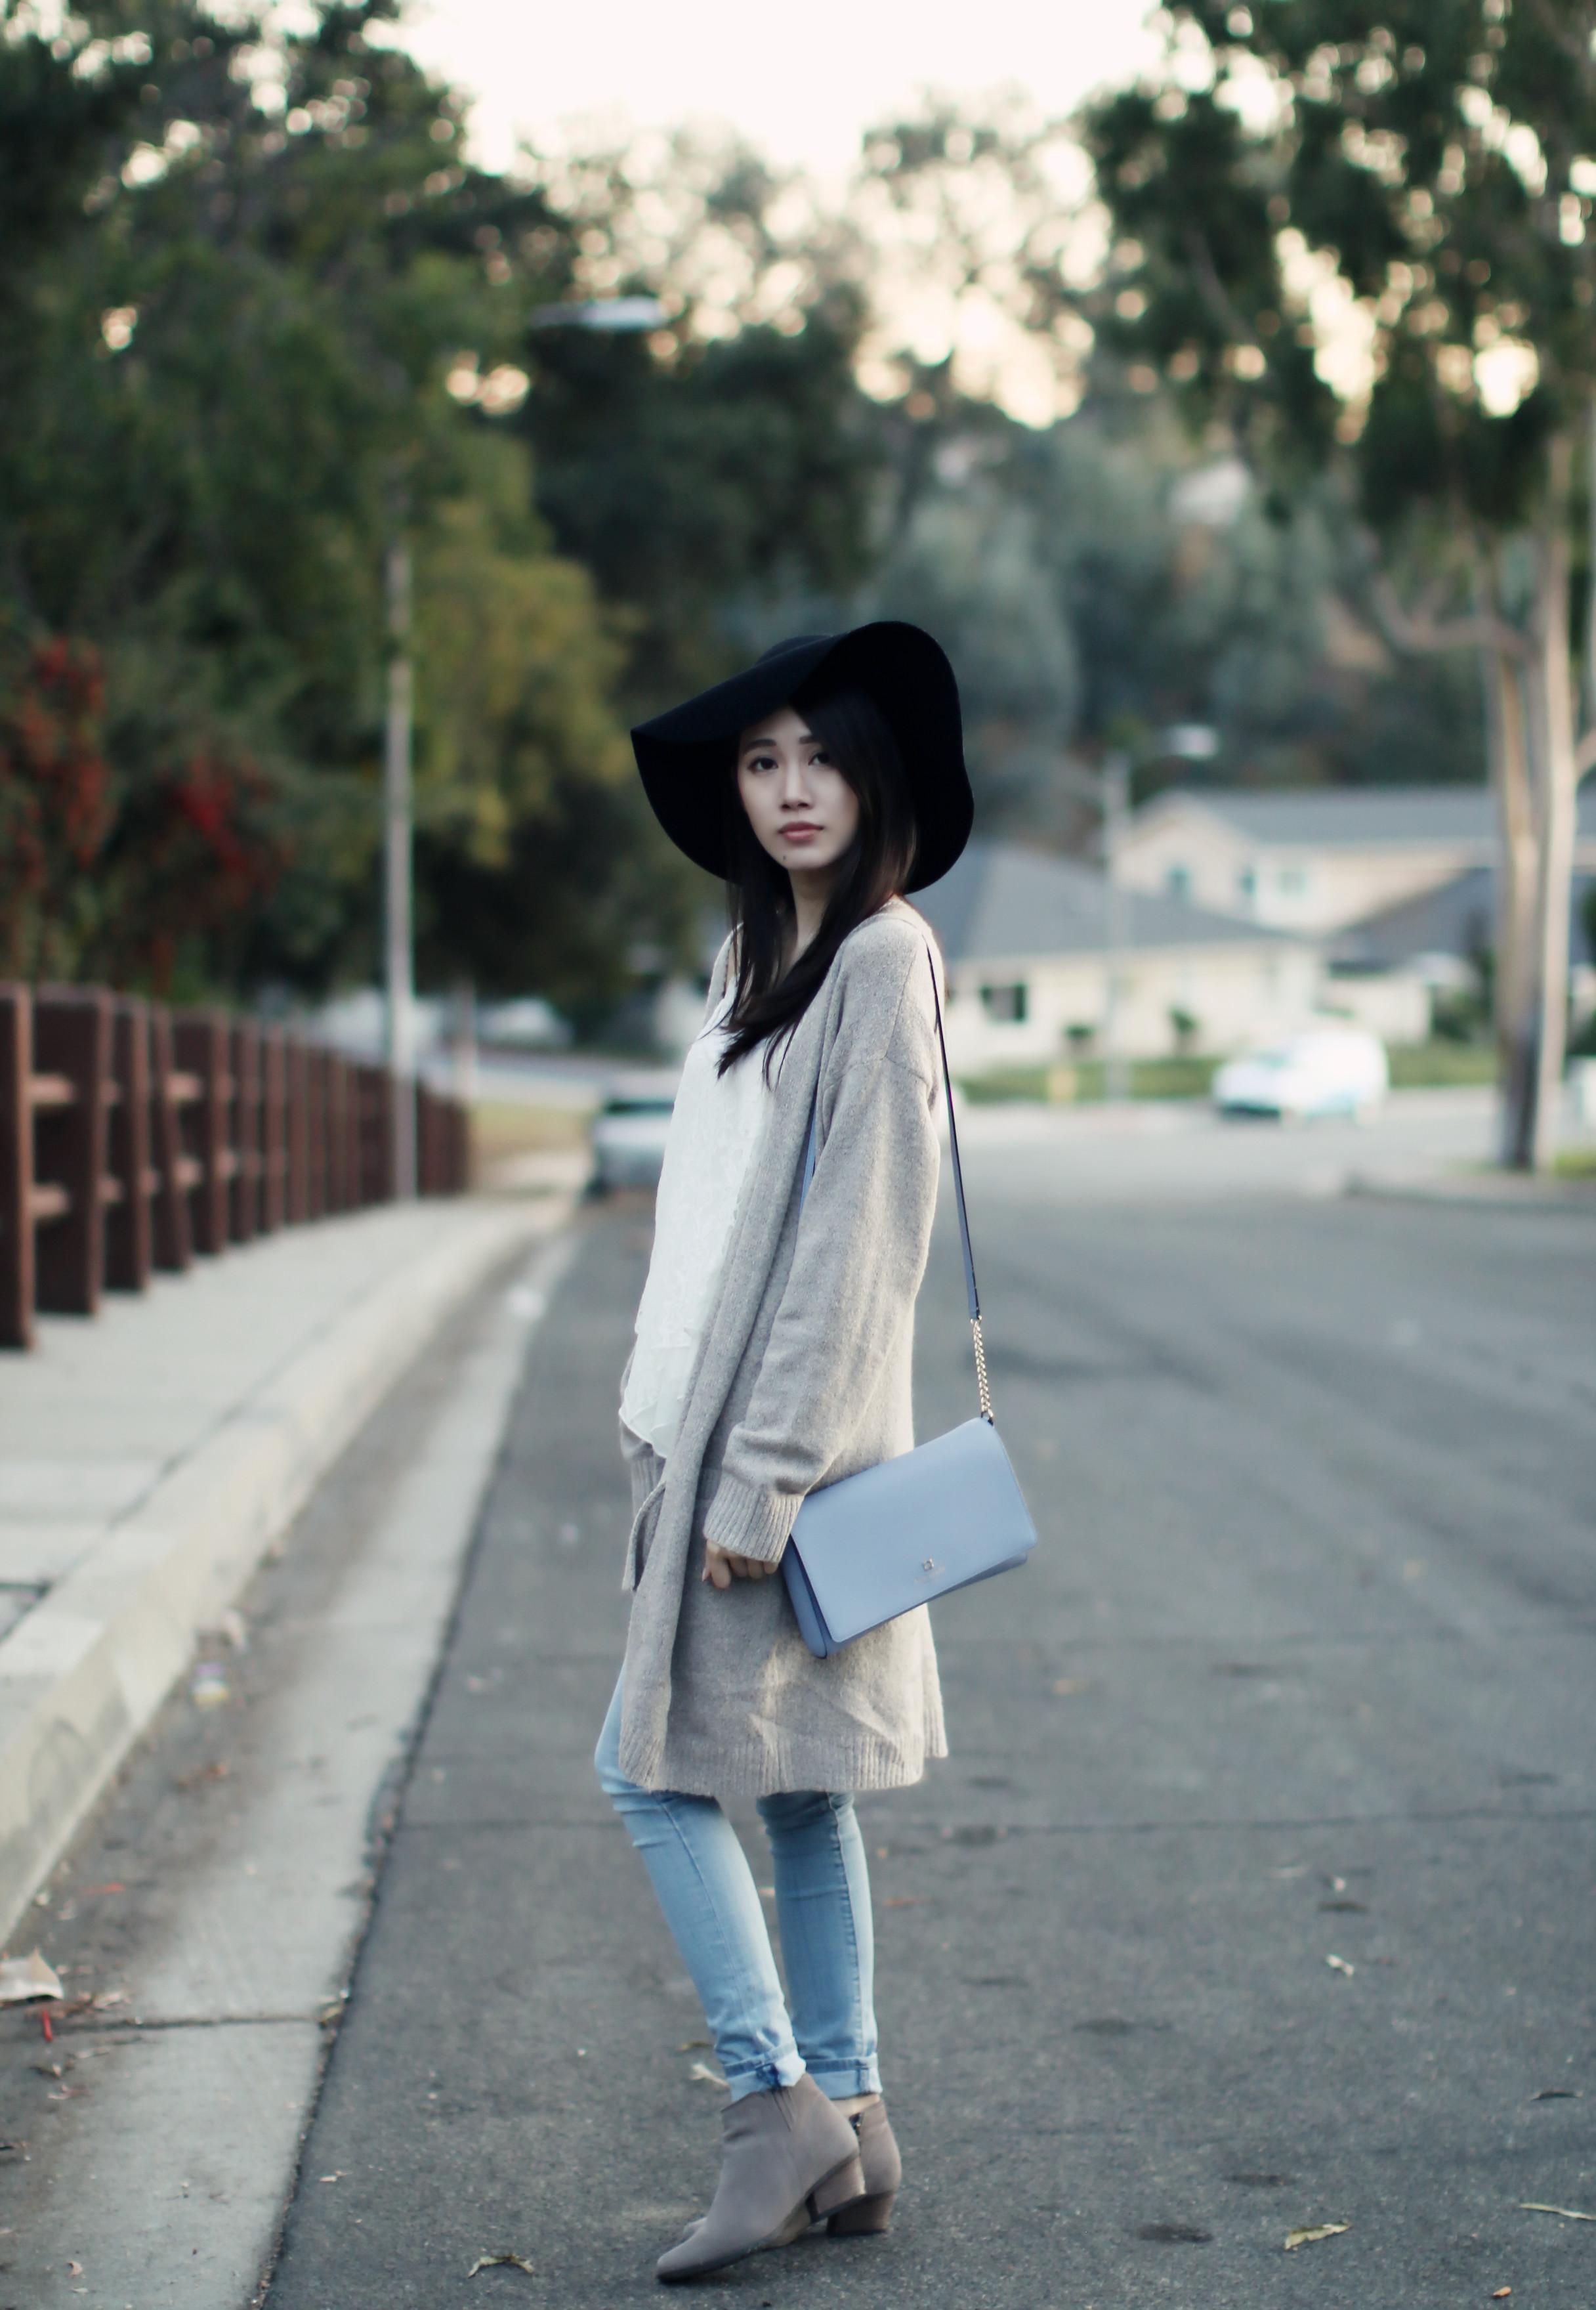 3854-ootd-fashion-style-outfitoftheday-wiwt-nordstrom-abercrombie-bohemian-fallfashion-forever21-f21-f21xme-koreanfashion-elizabeeetht-clothestoyouuu